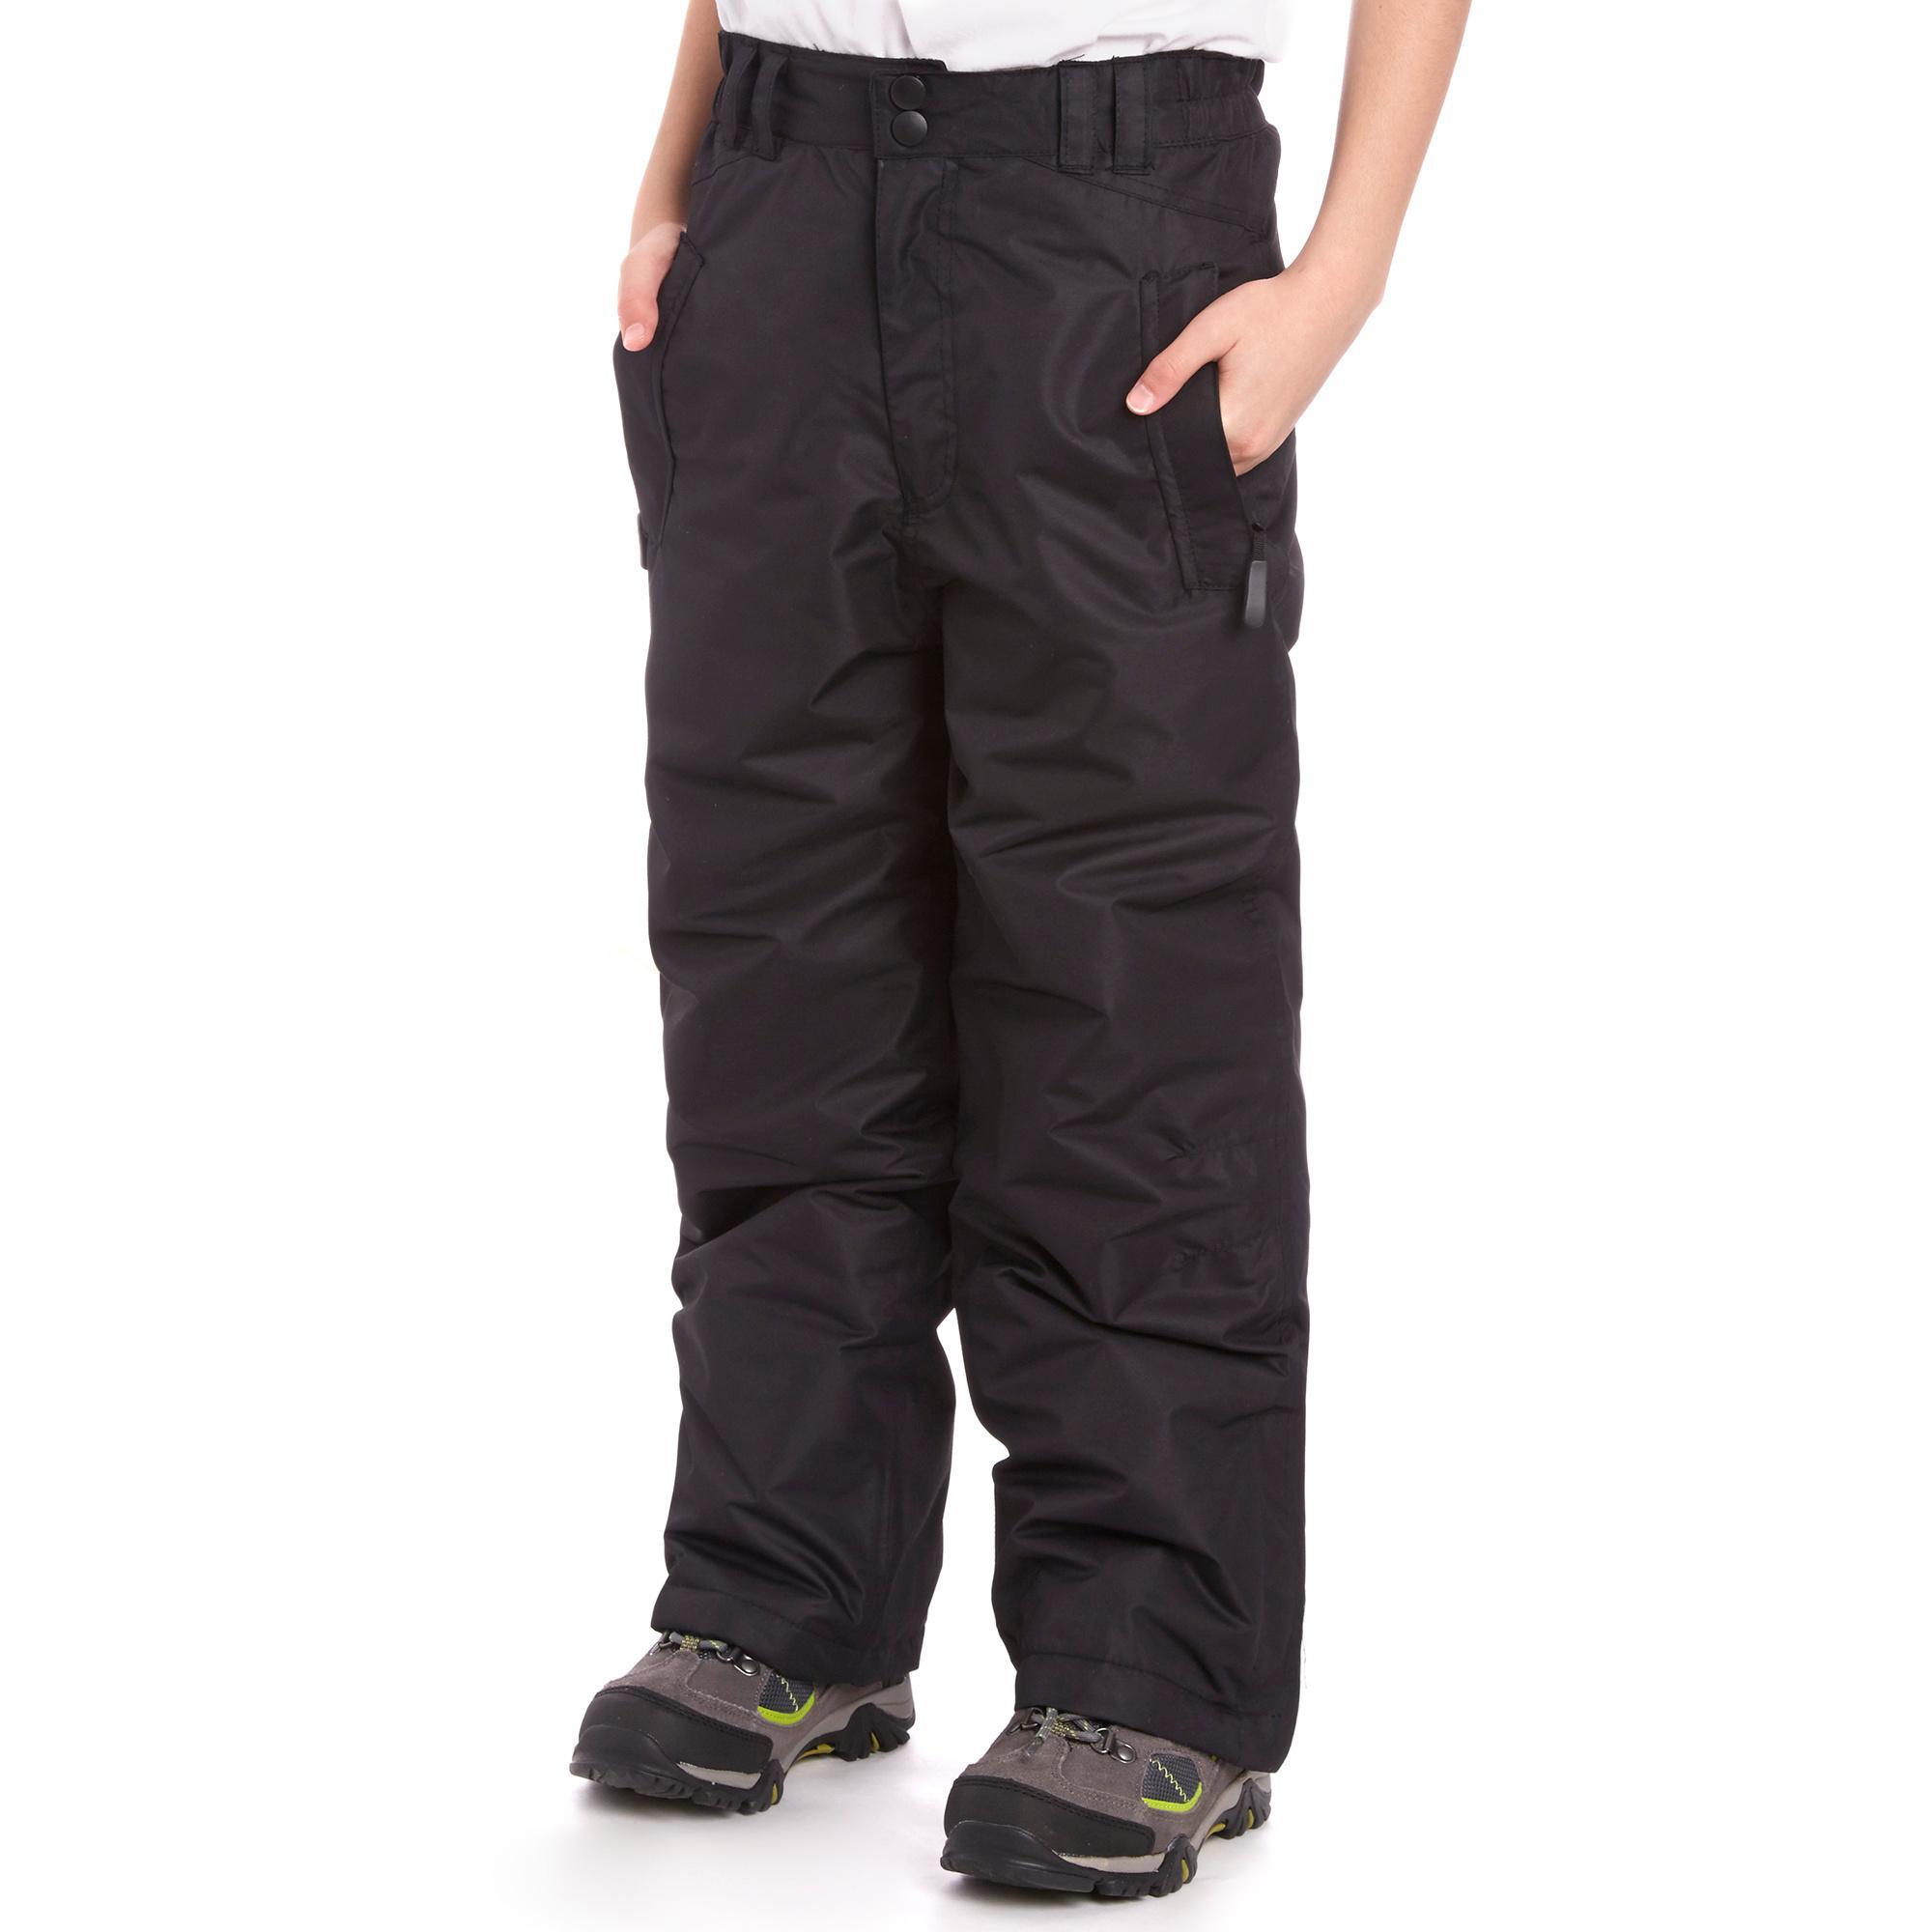 Alpine Boy's Ski Pants, Black